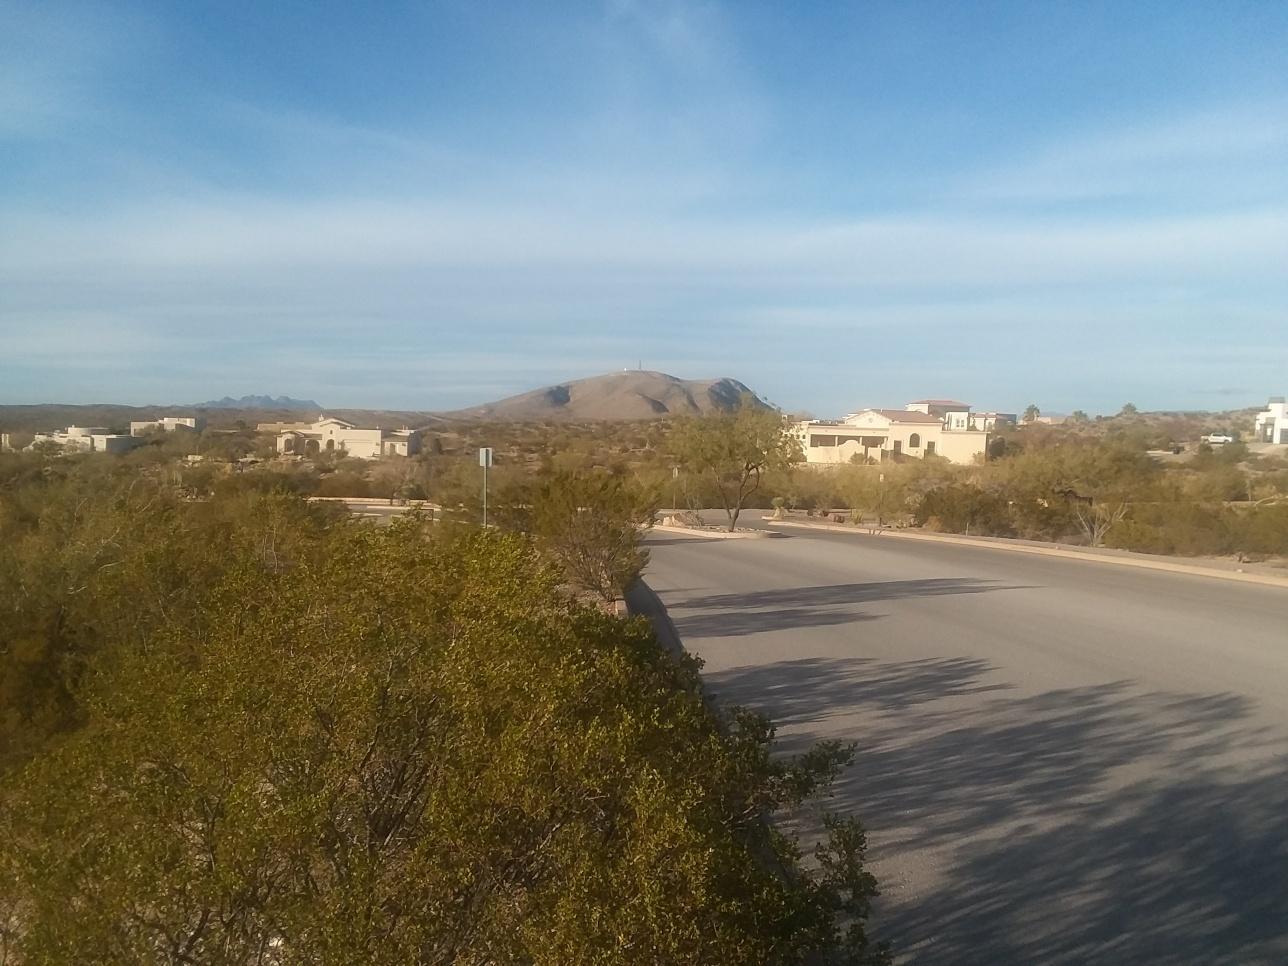 5538 CAMINO ESCONDIDA, Las Cruces, New Mexico 88011, ,Land,For sale,CAMINO ESCONDIDA,839398